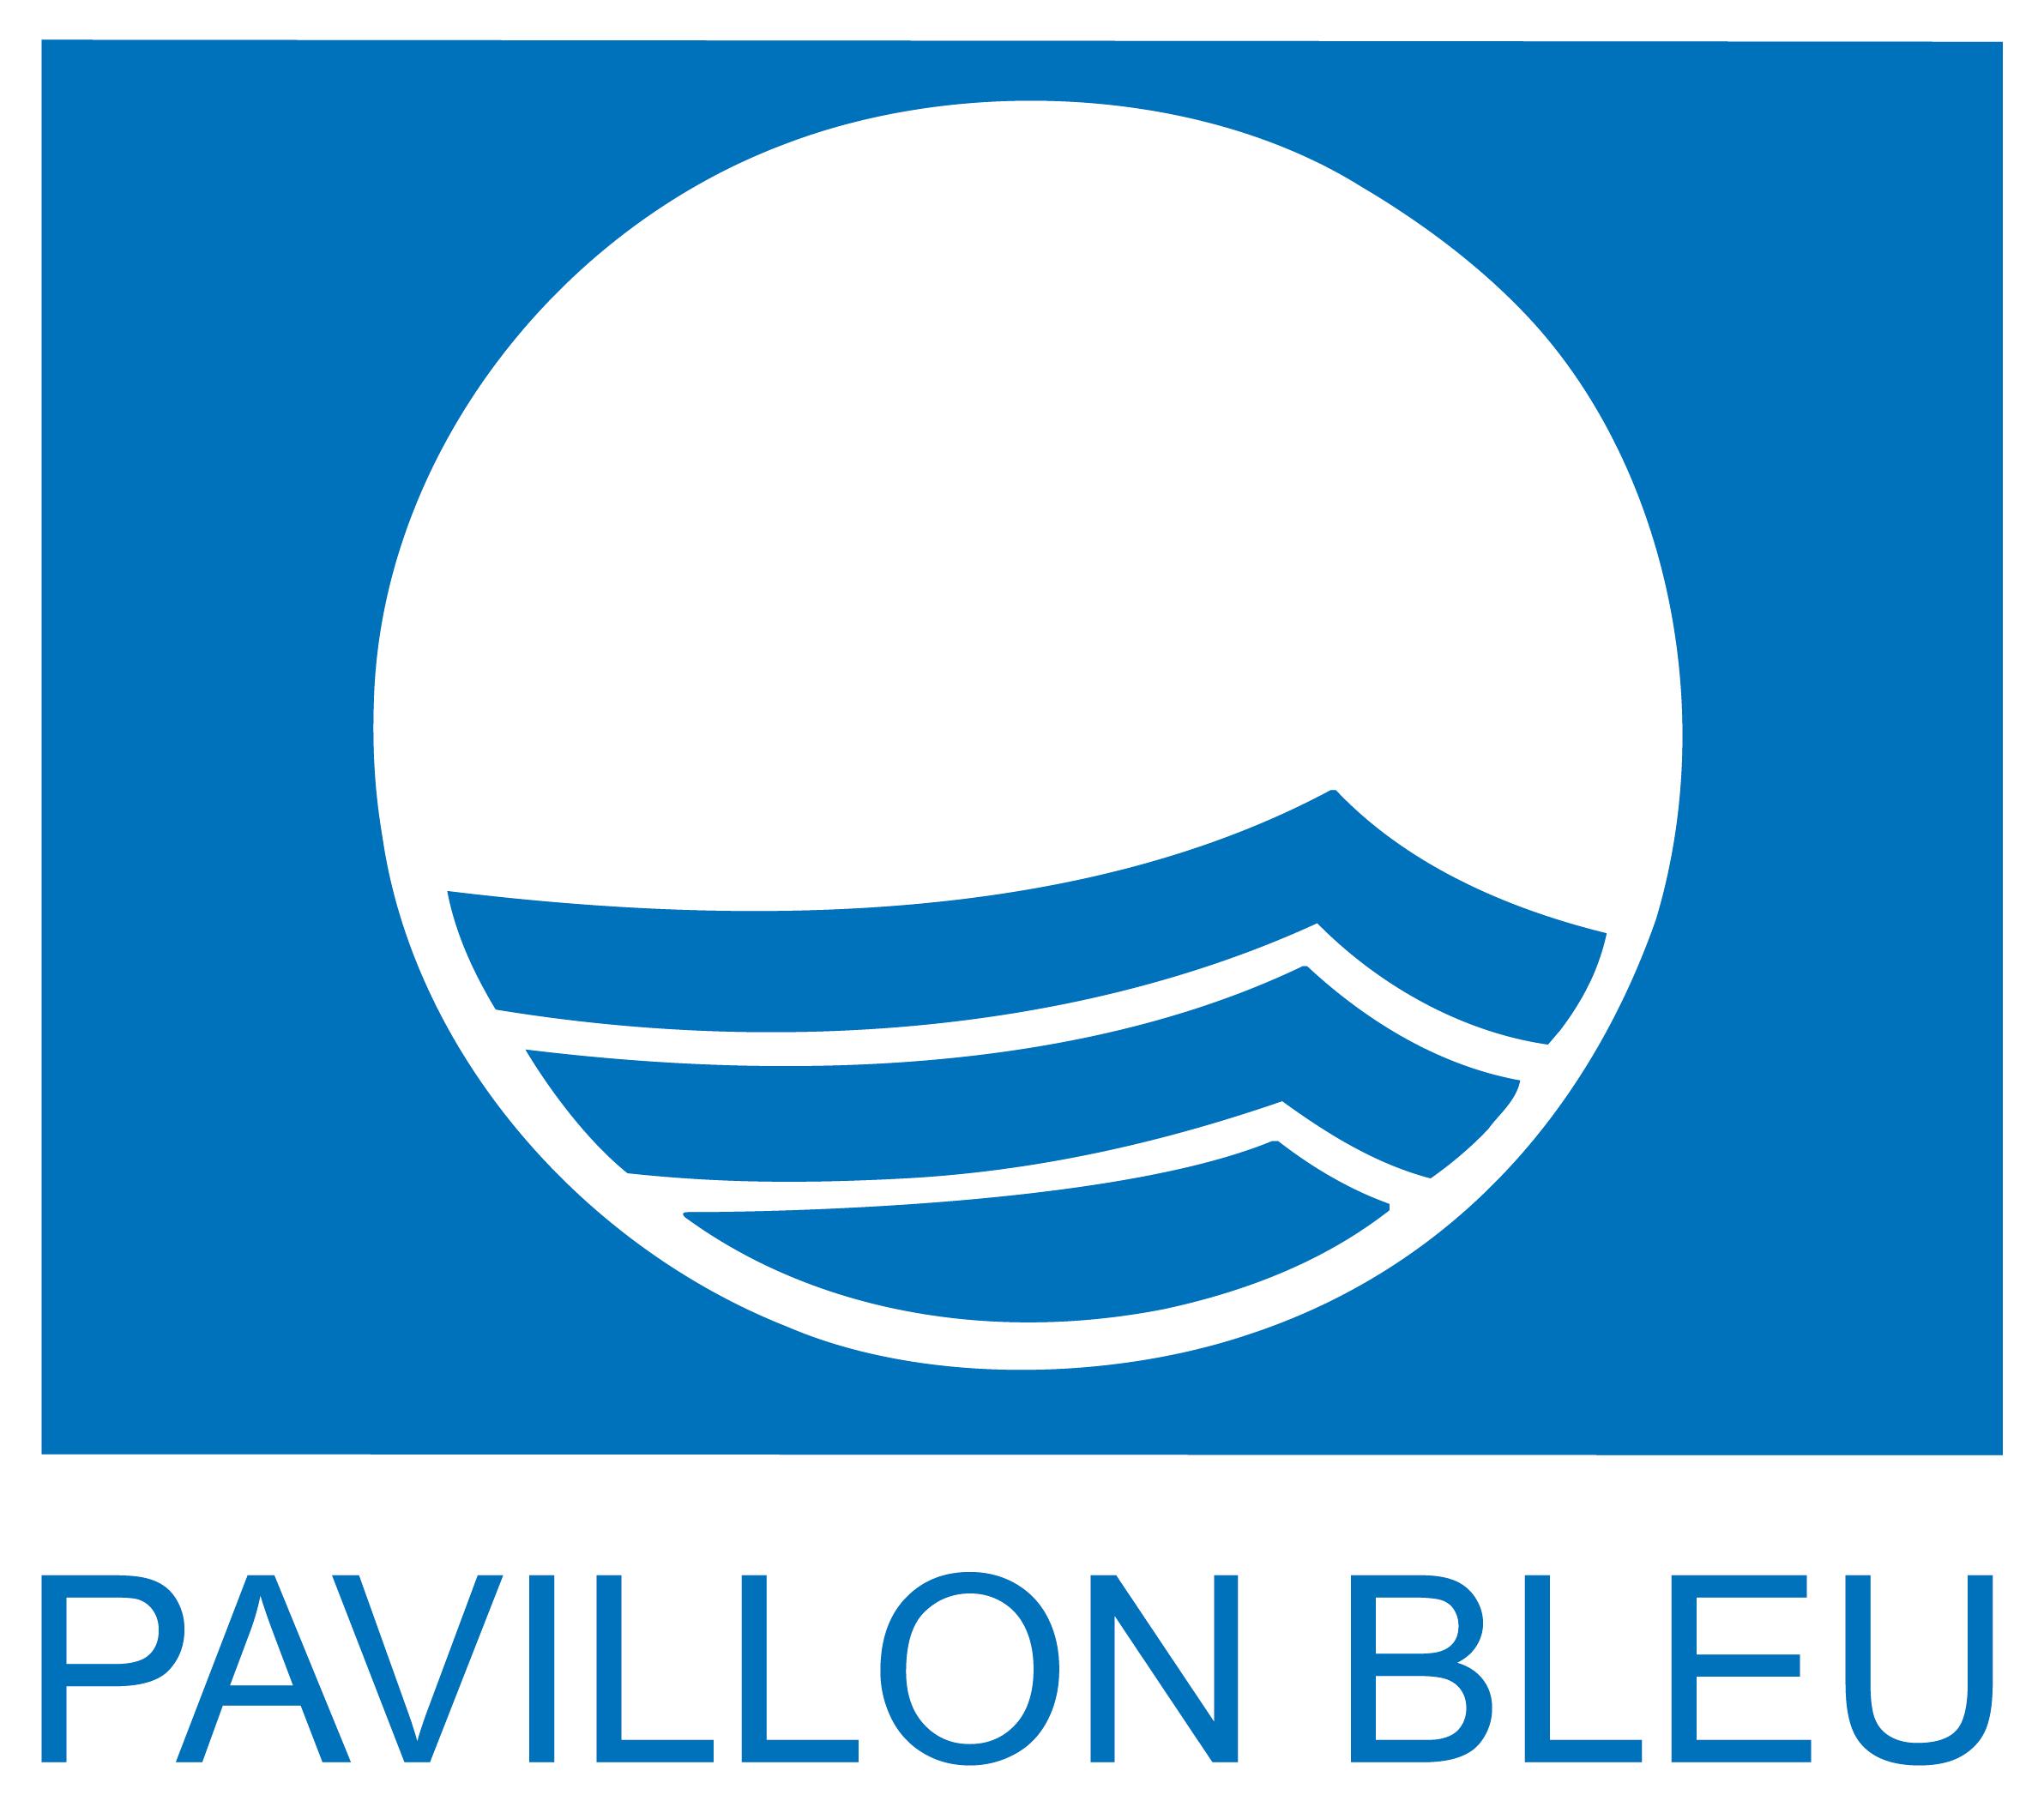 Pavillon bleu Cayeux sur mer 2018